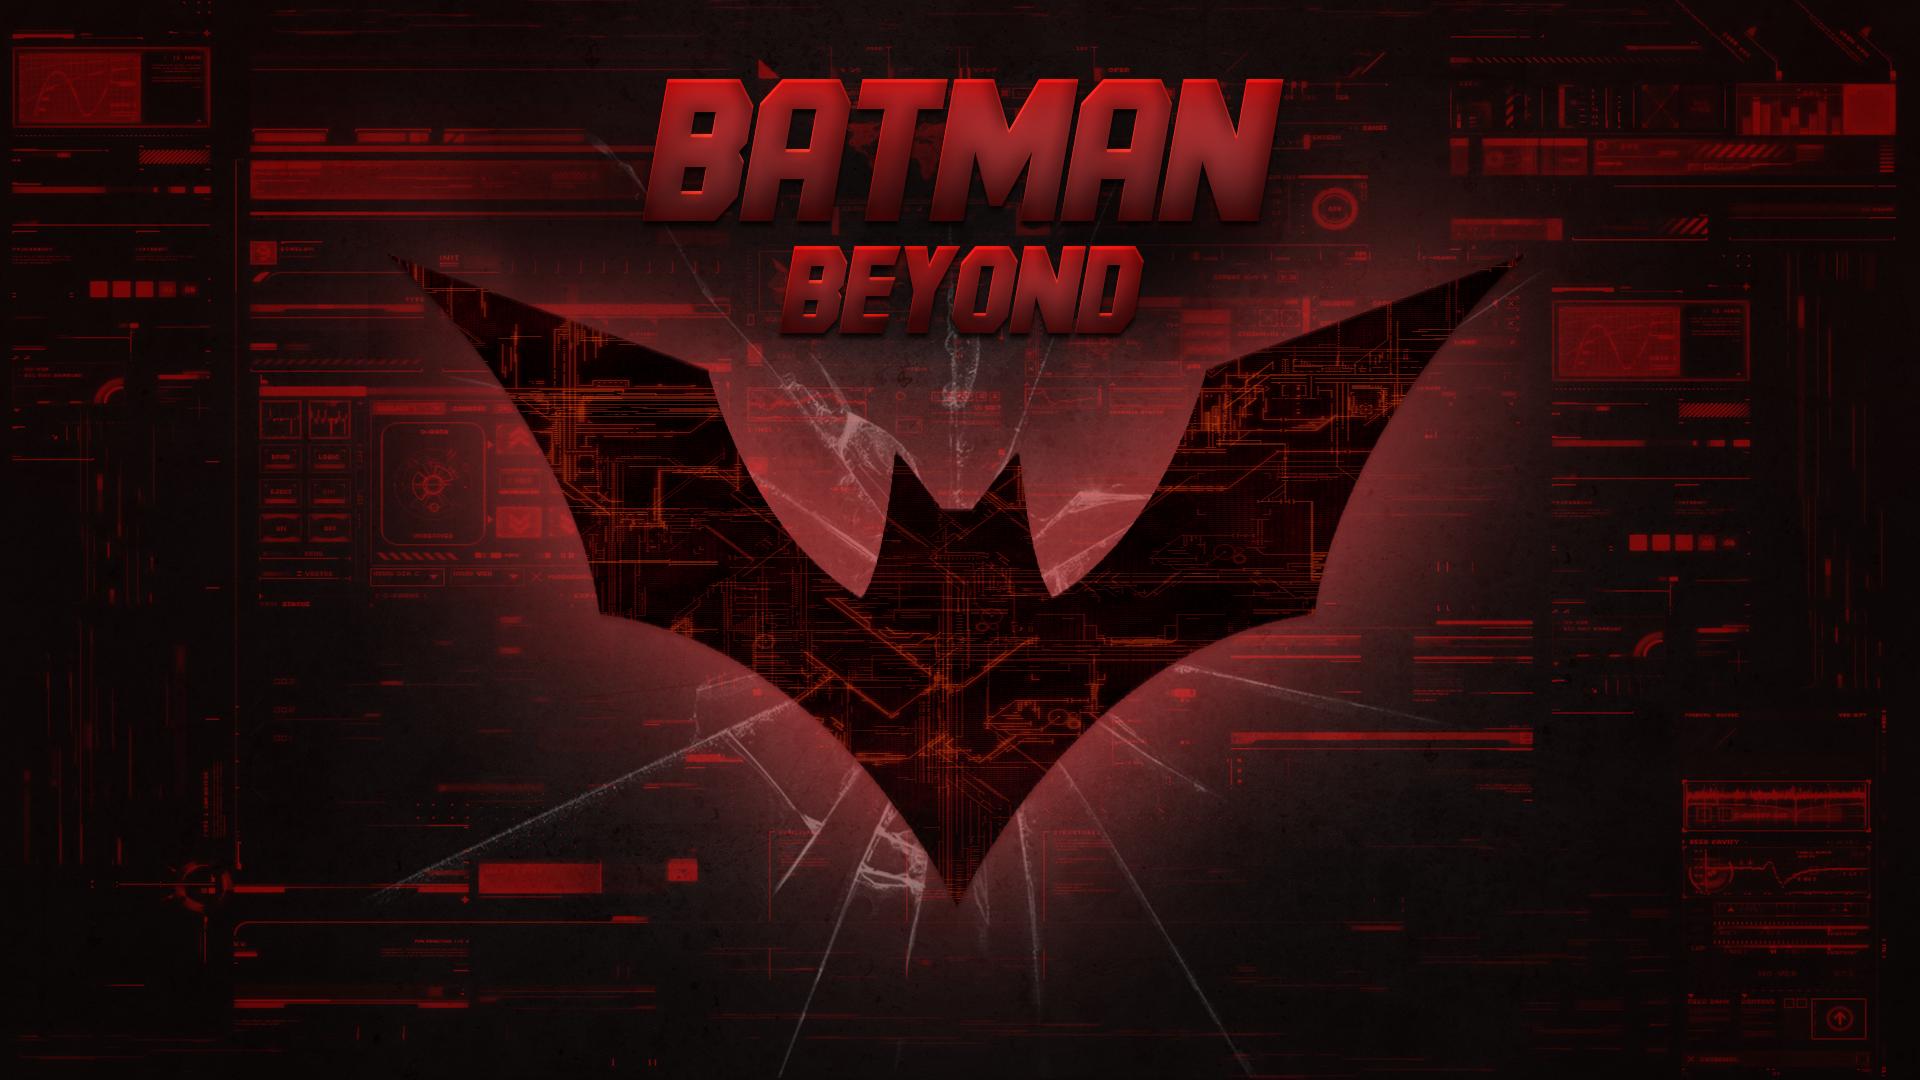 batman beyond wallpaper injustice wwwimgkidcom the